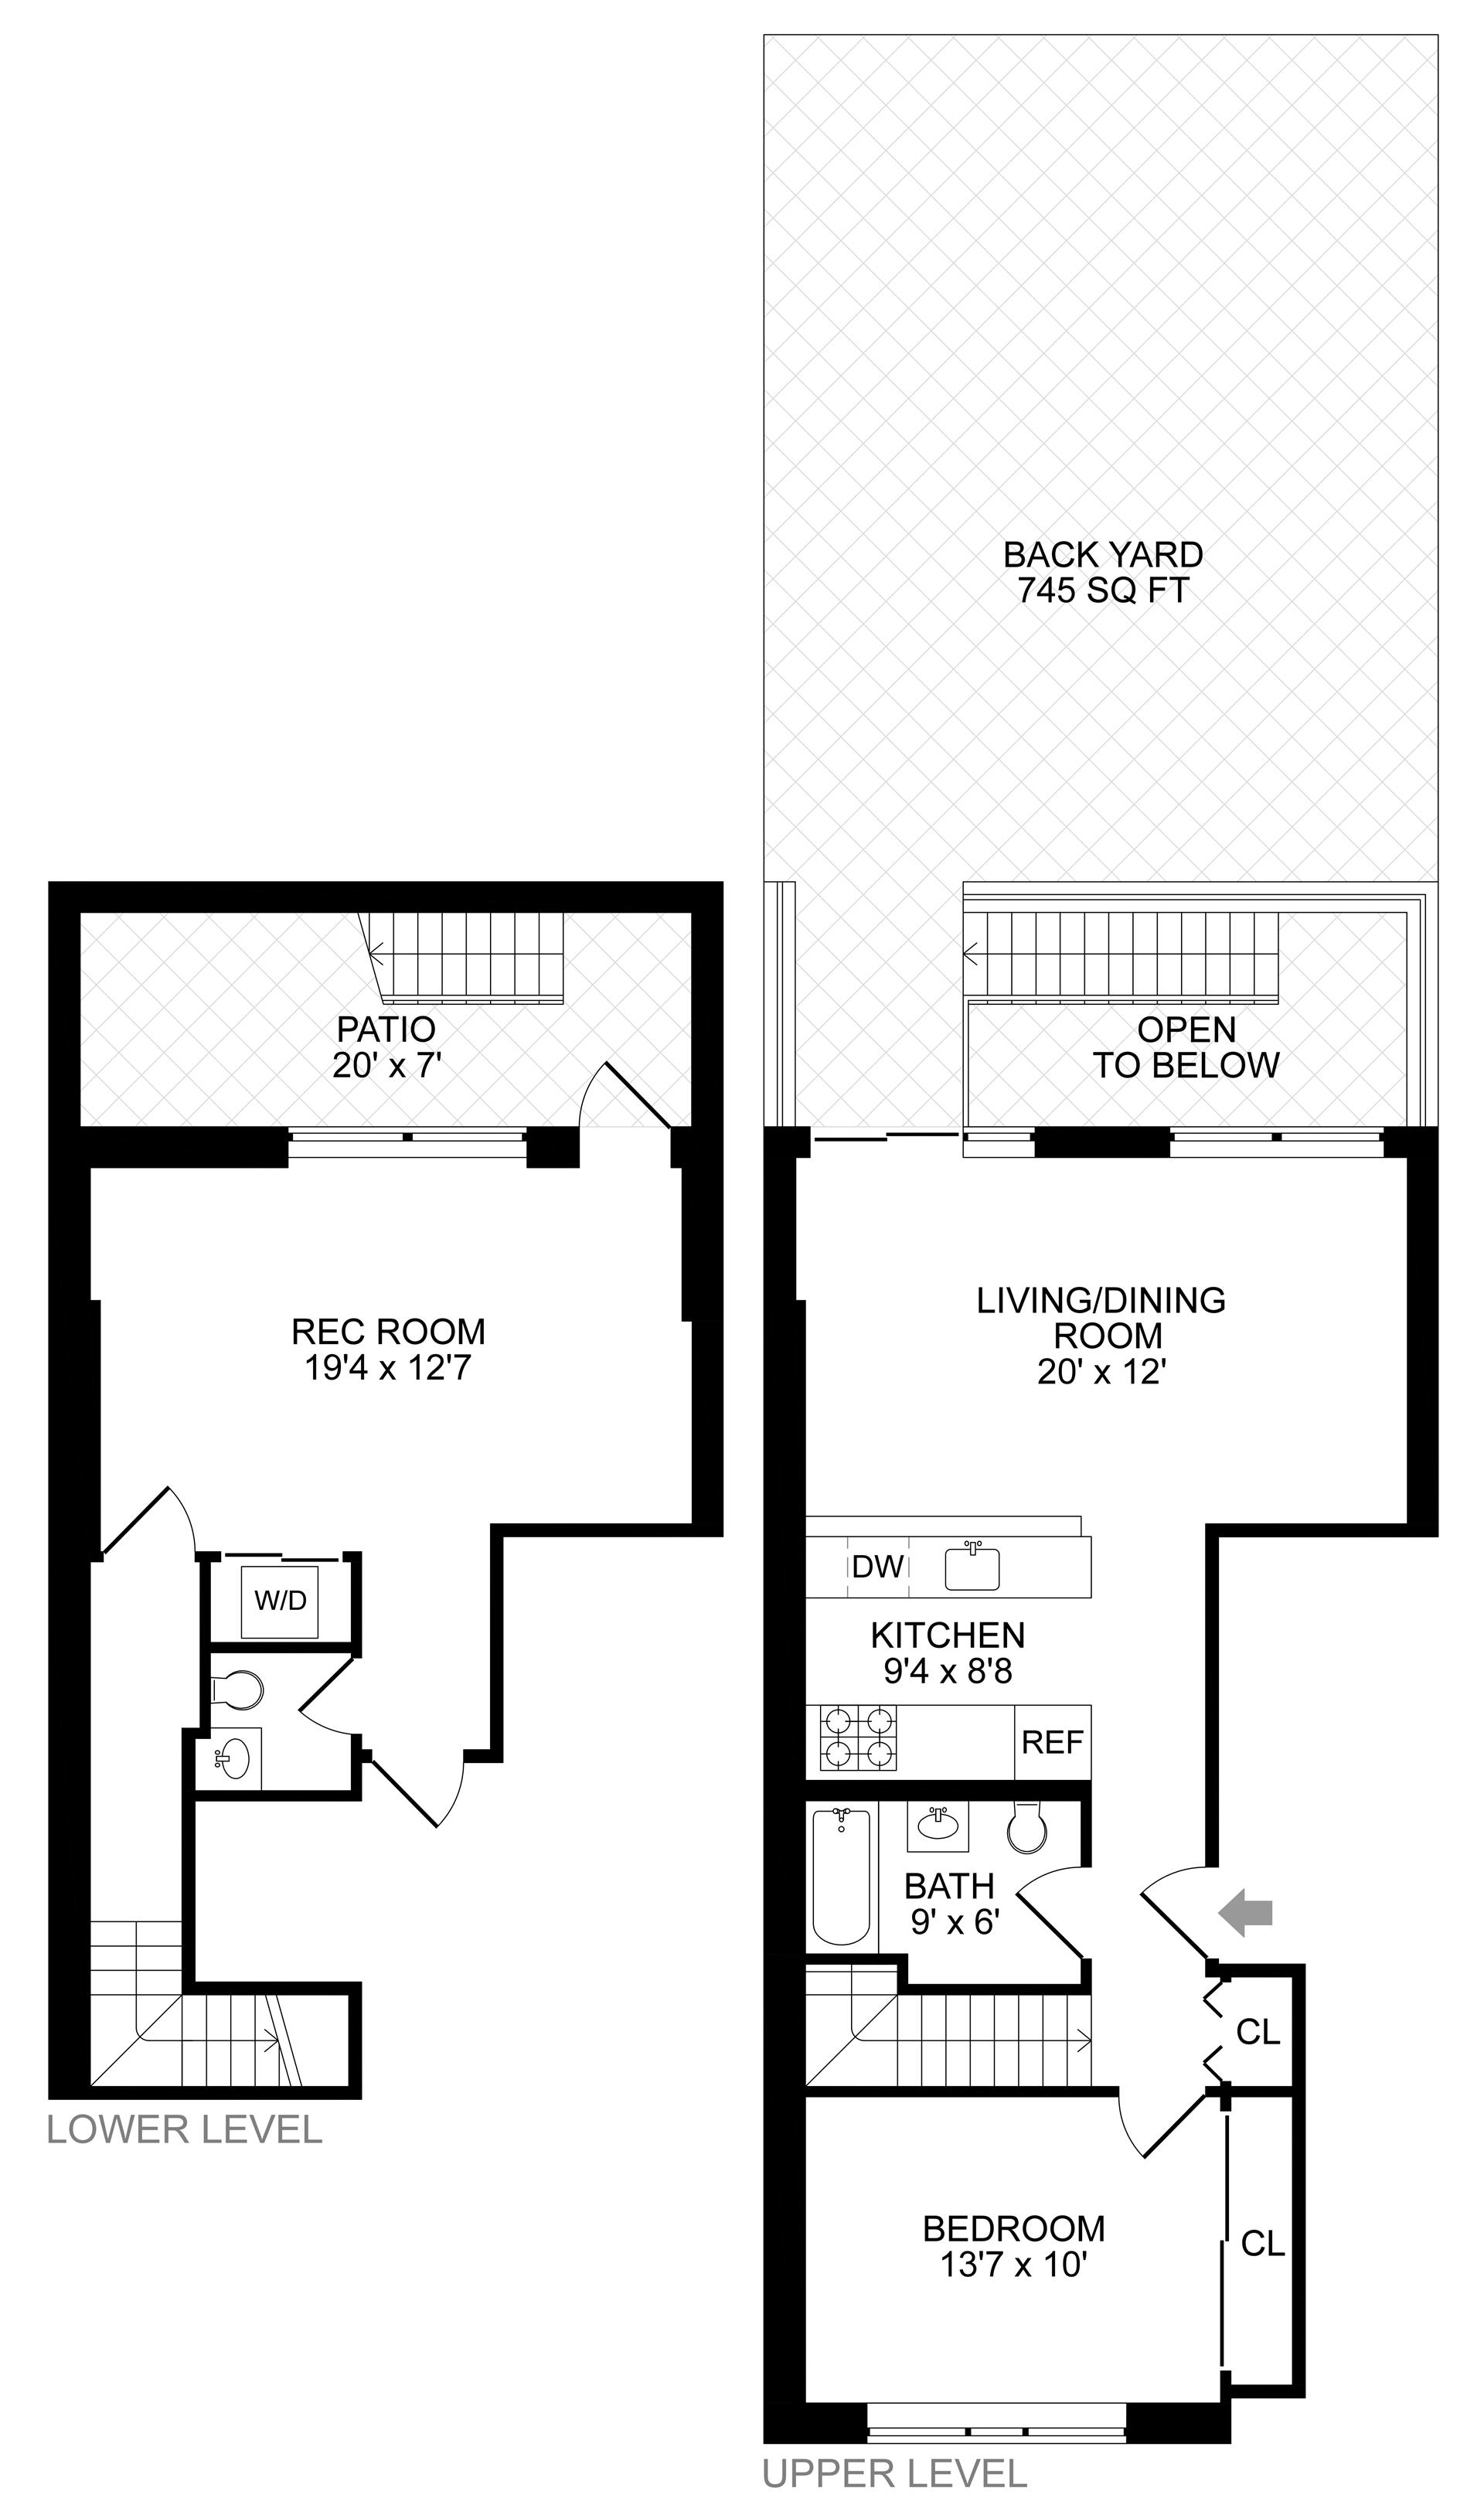 Floor plan of 165 Taaffe Pl, 1 - Clinton Hill, New York